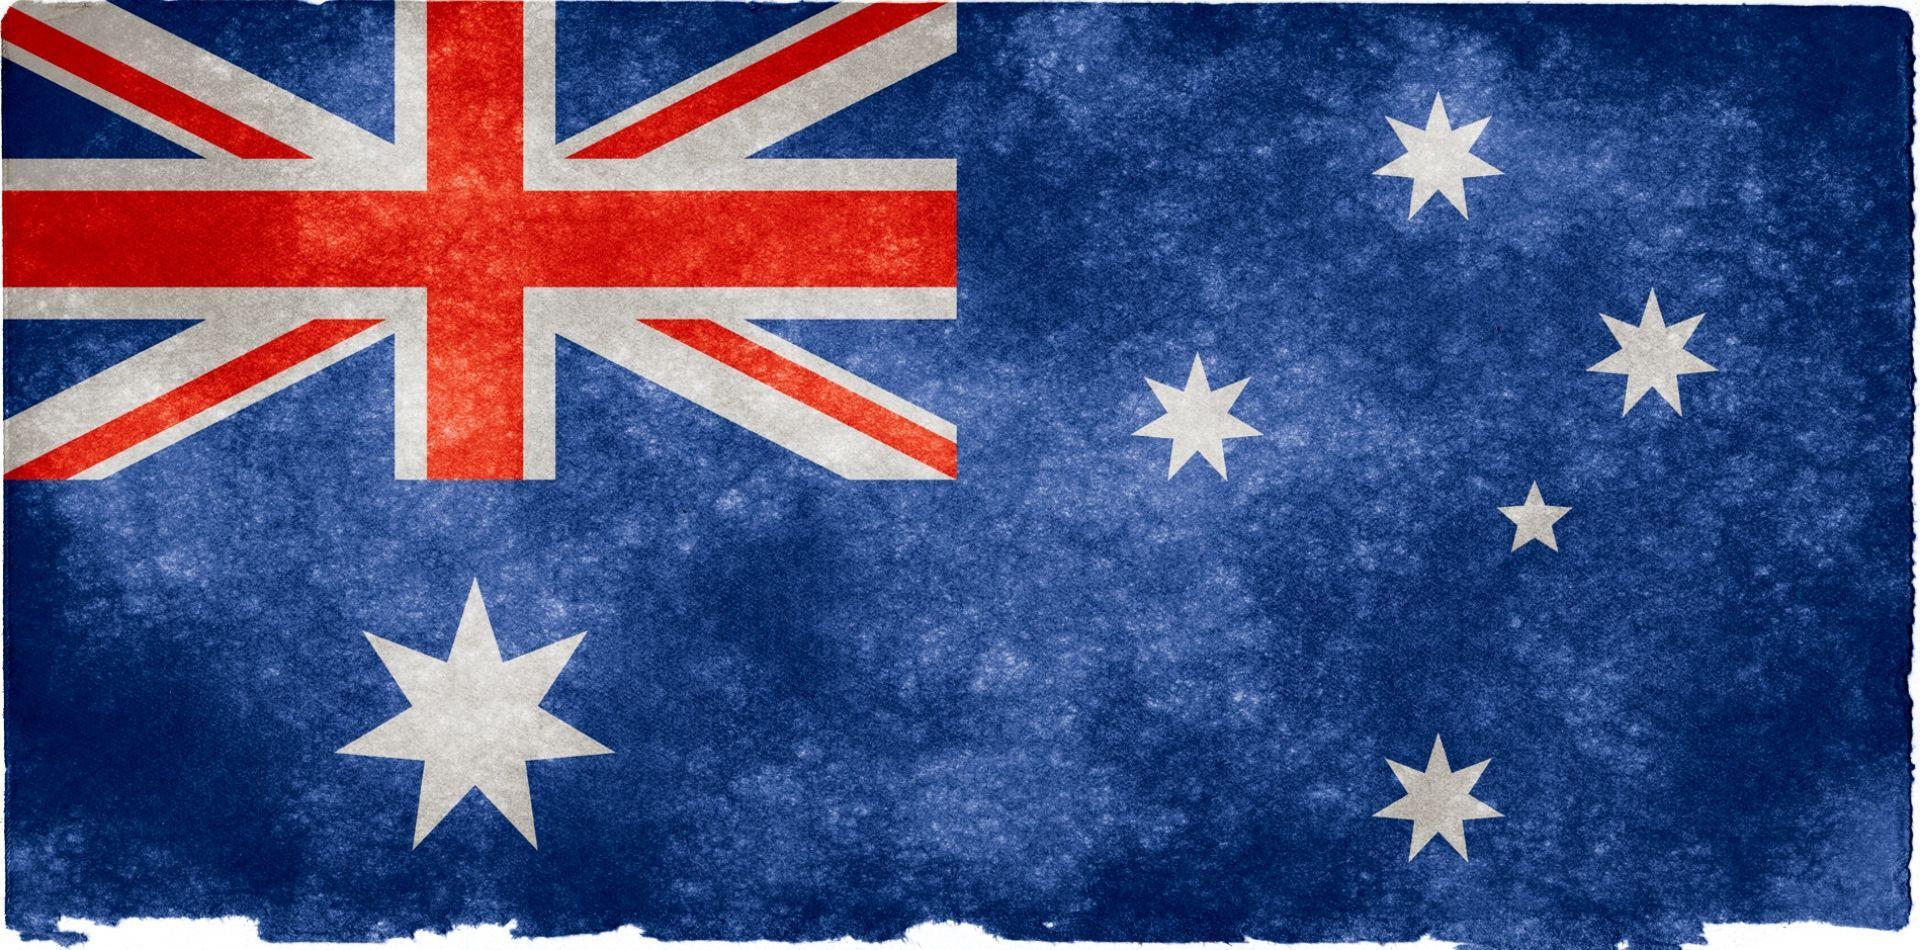 Australia Flag Wallpapers - Top Free Australia Flag Backgrounds - WallpaperAccess